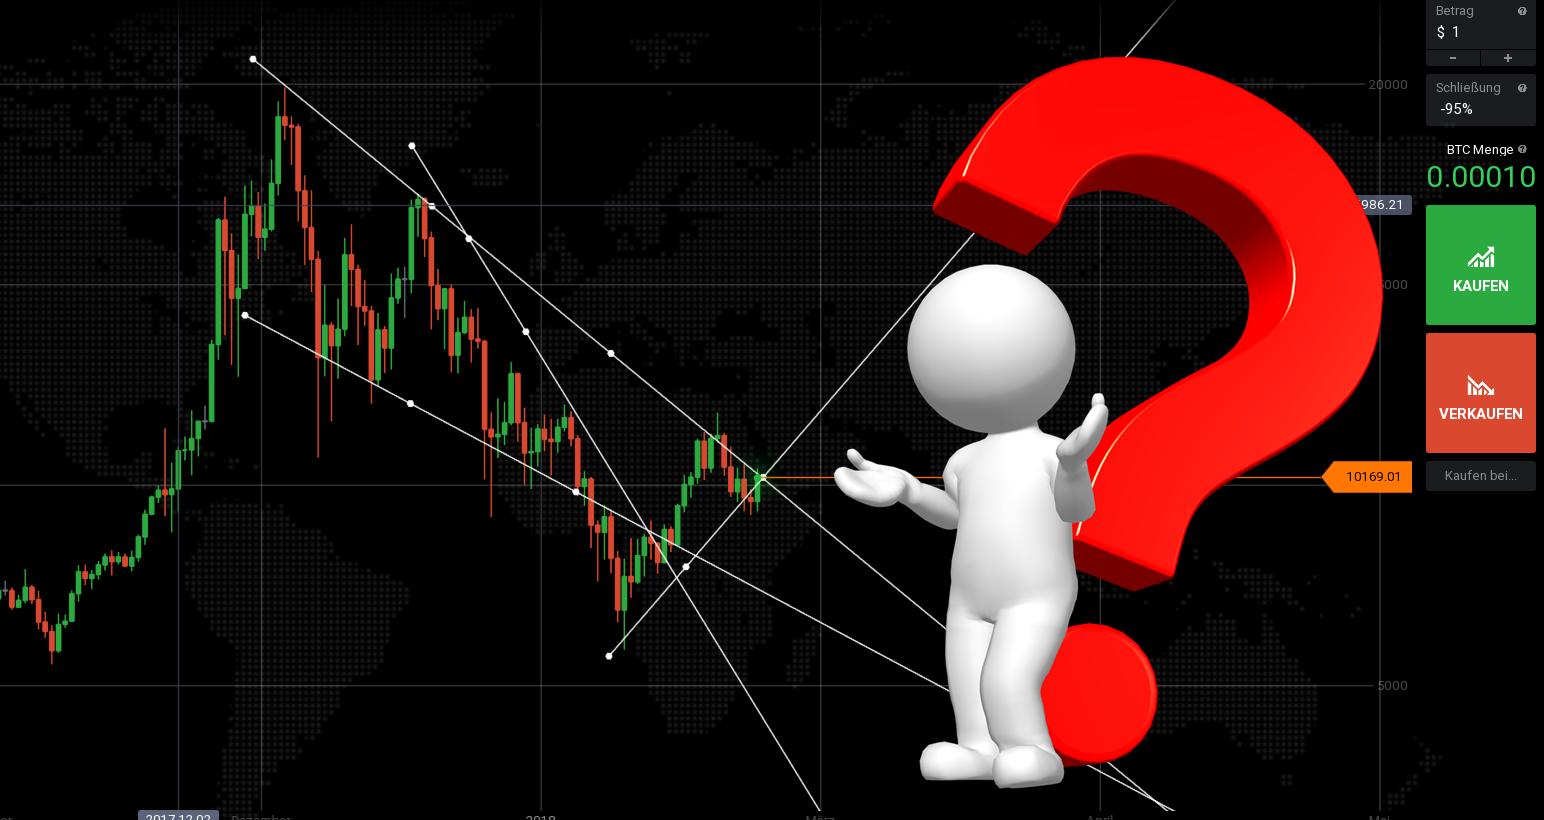 kryptowährungen trading tipps